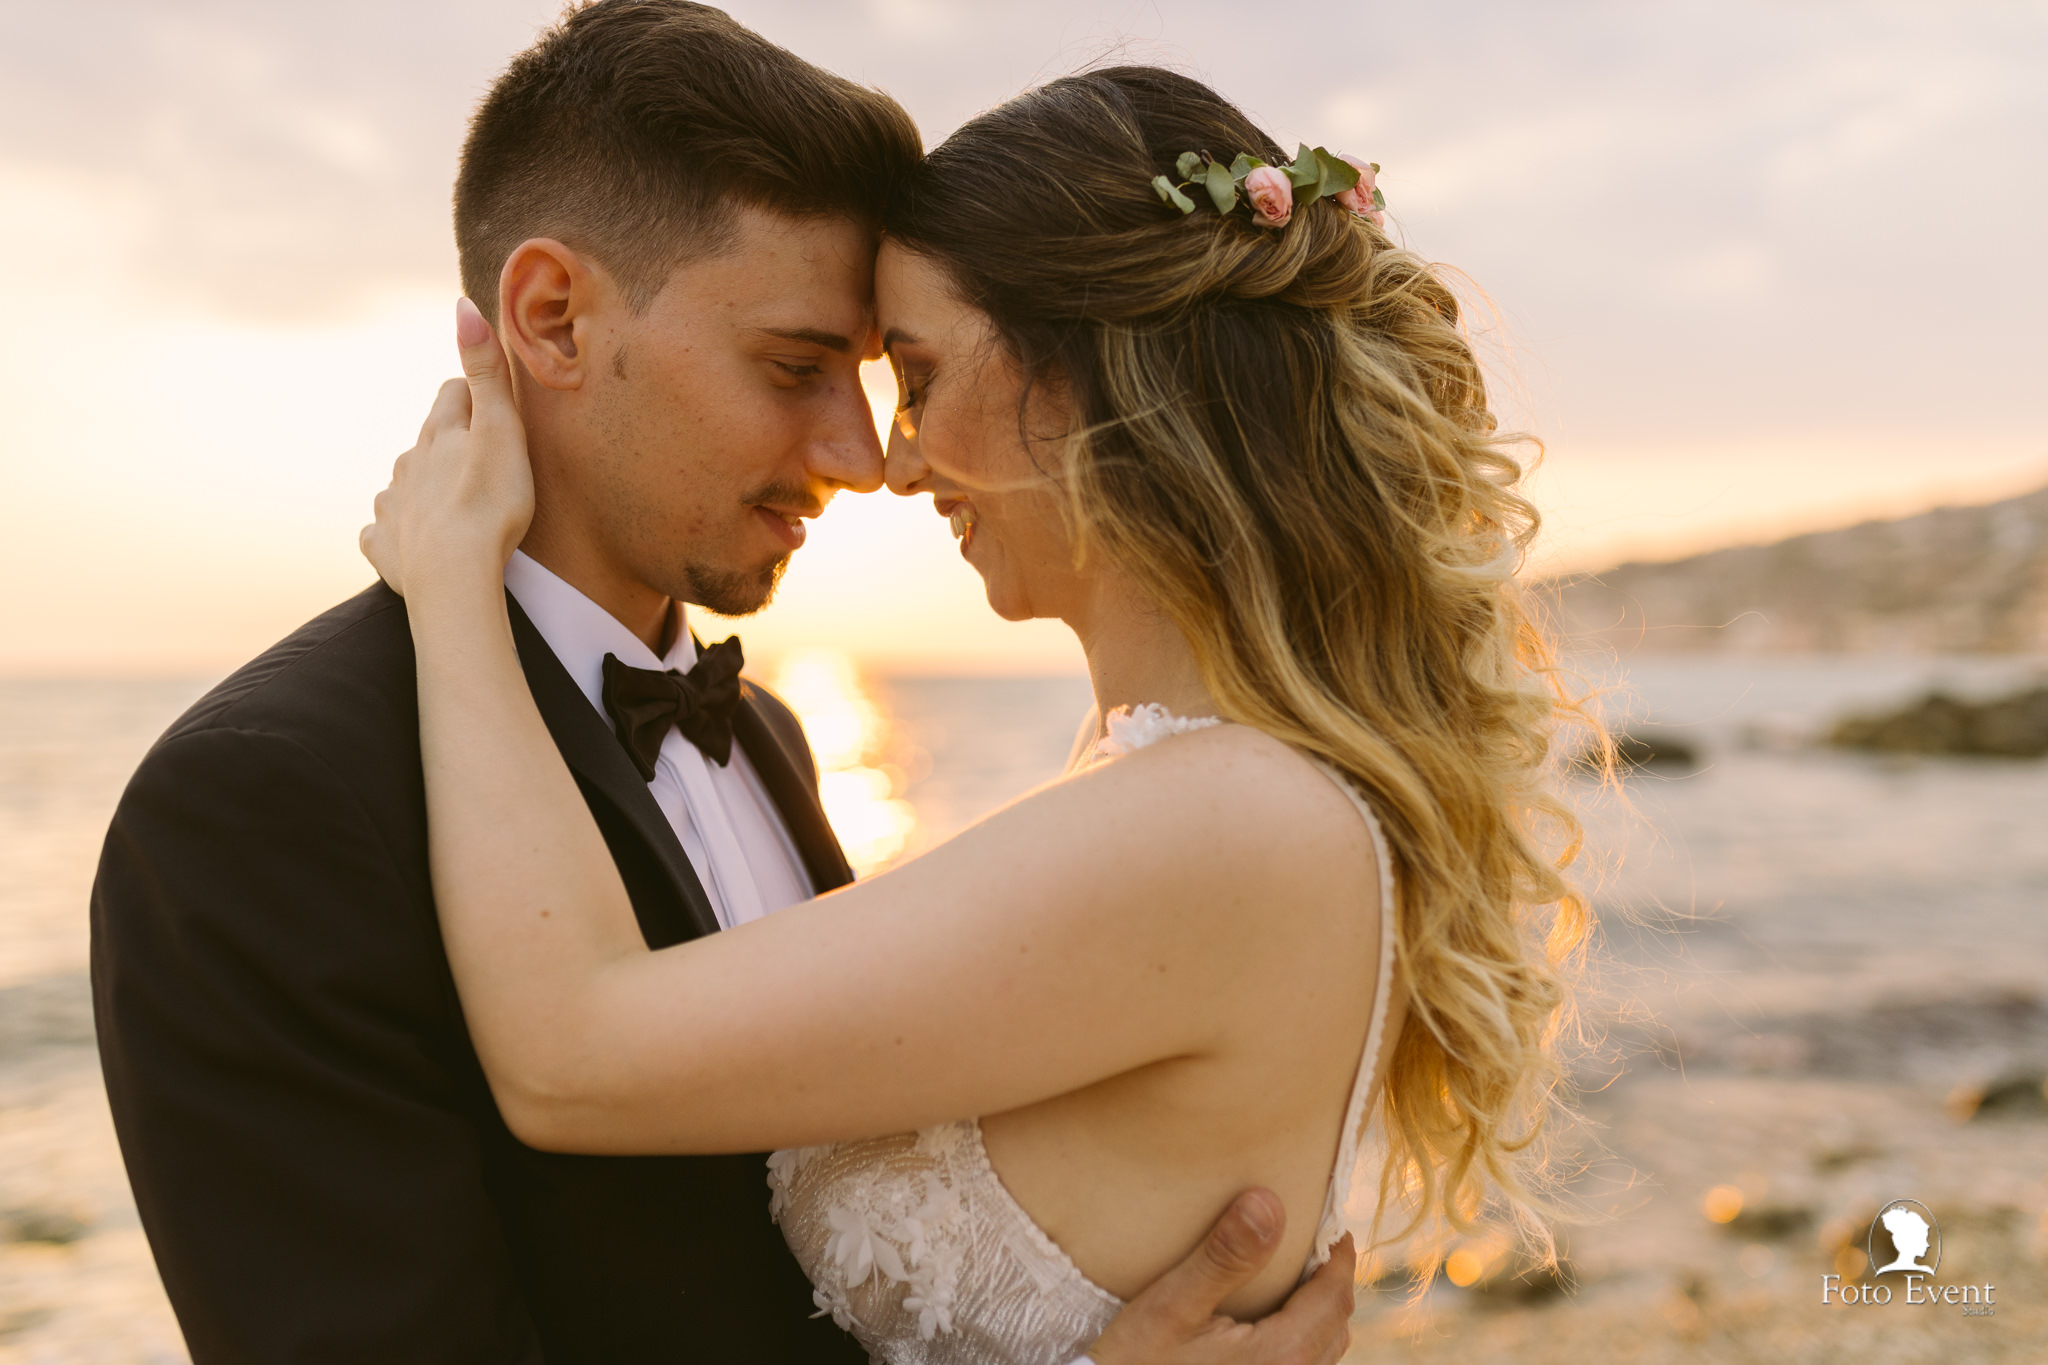 051-2019-08-22-Matrimonio-Angela-e-Nicola-Iaconis-Ric2-593